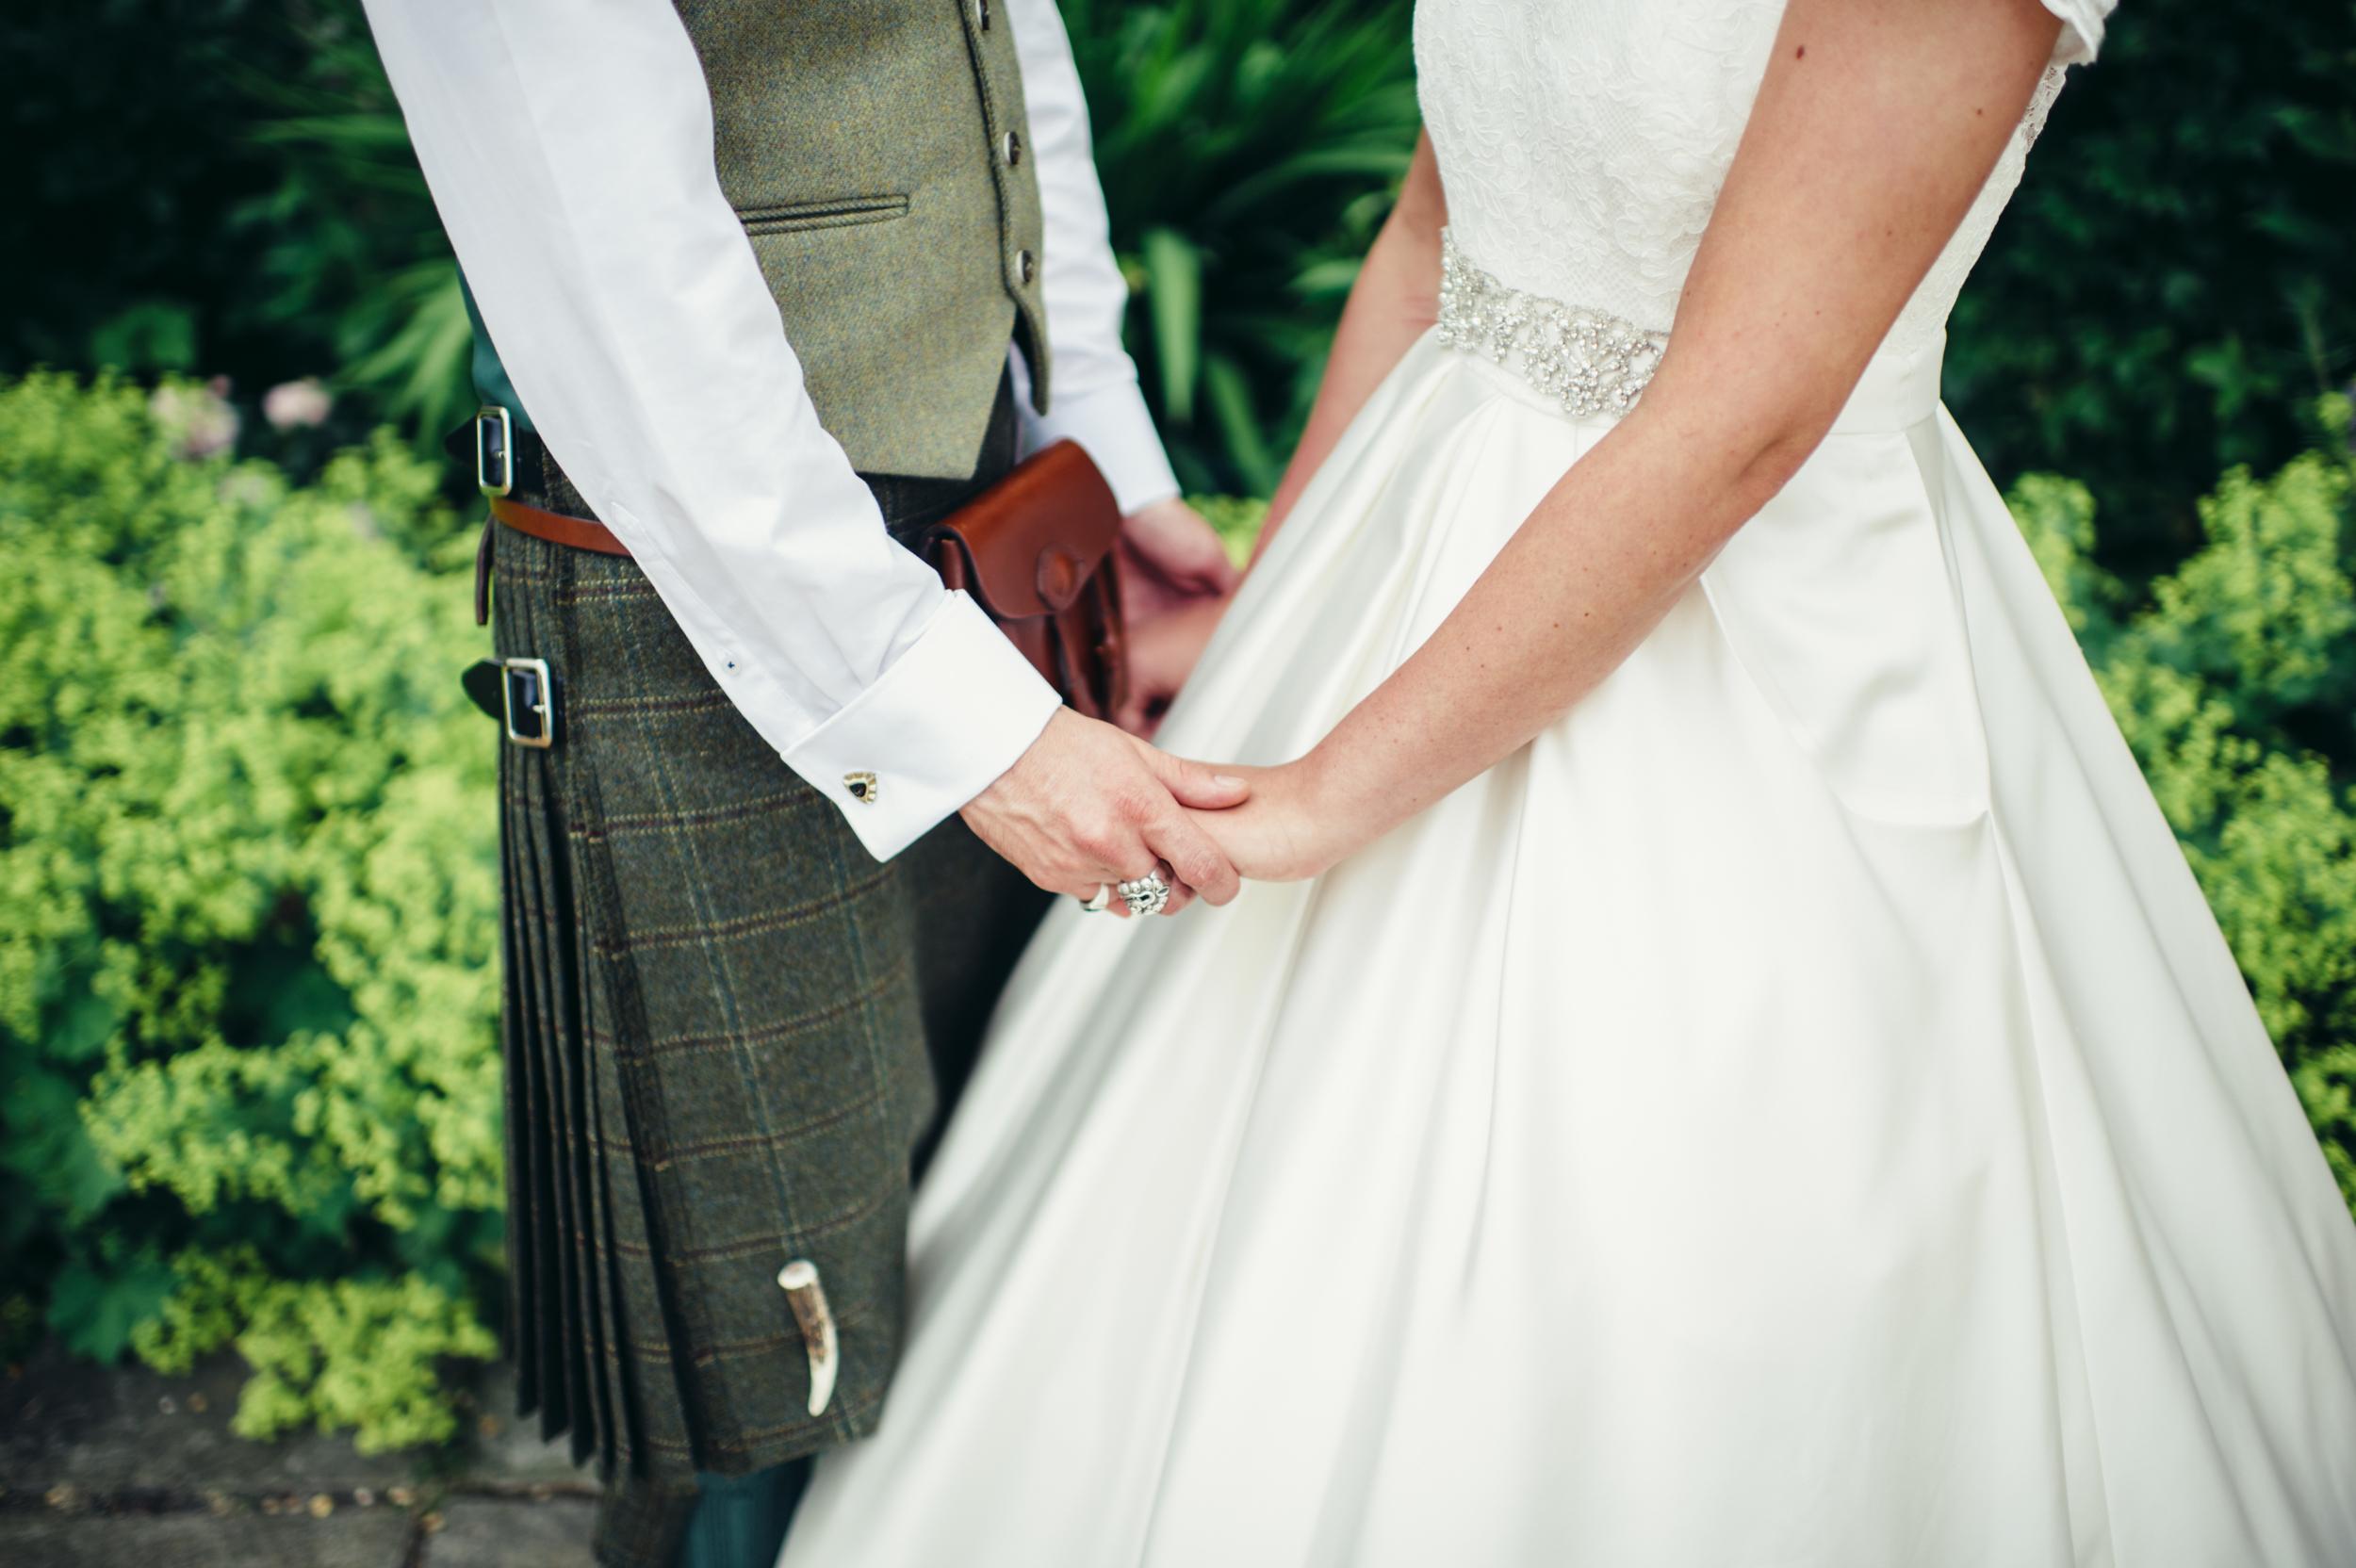 0179-lisa-devine-alternative-creative-wedding-photography-glasgow-edinburgh.JPG